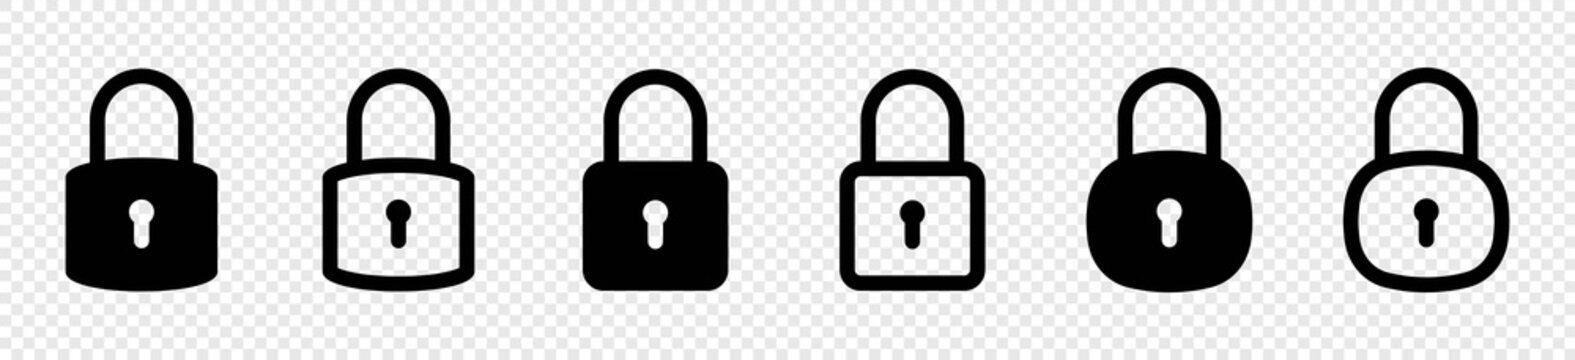 Lock icon set, lock symbol isolated on transparent background,  vector illustration